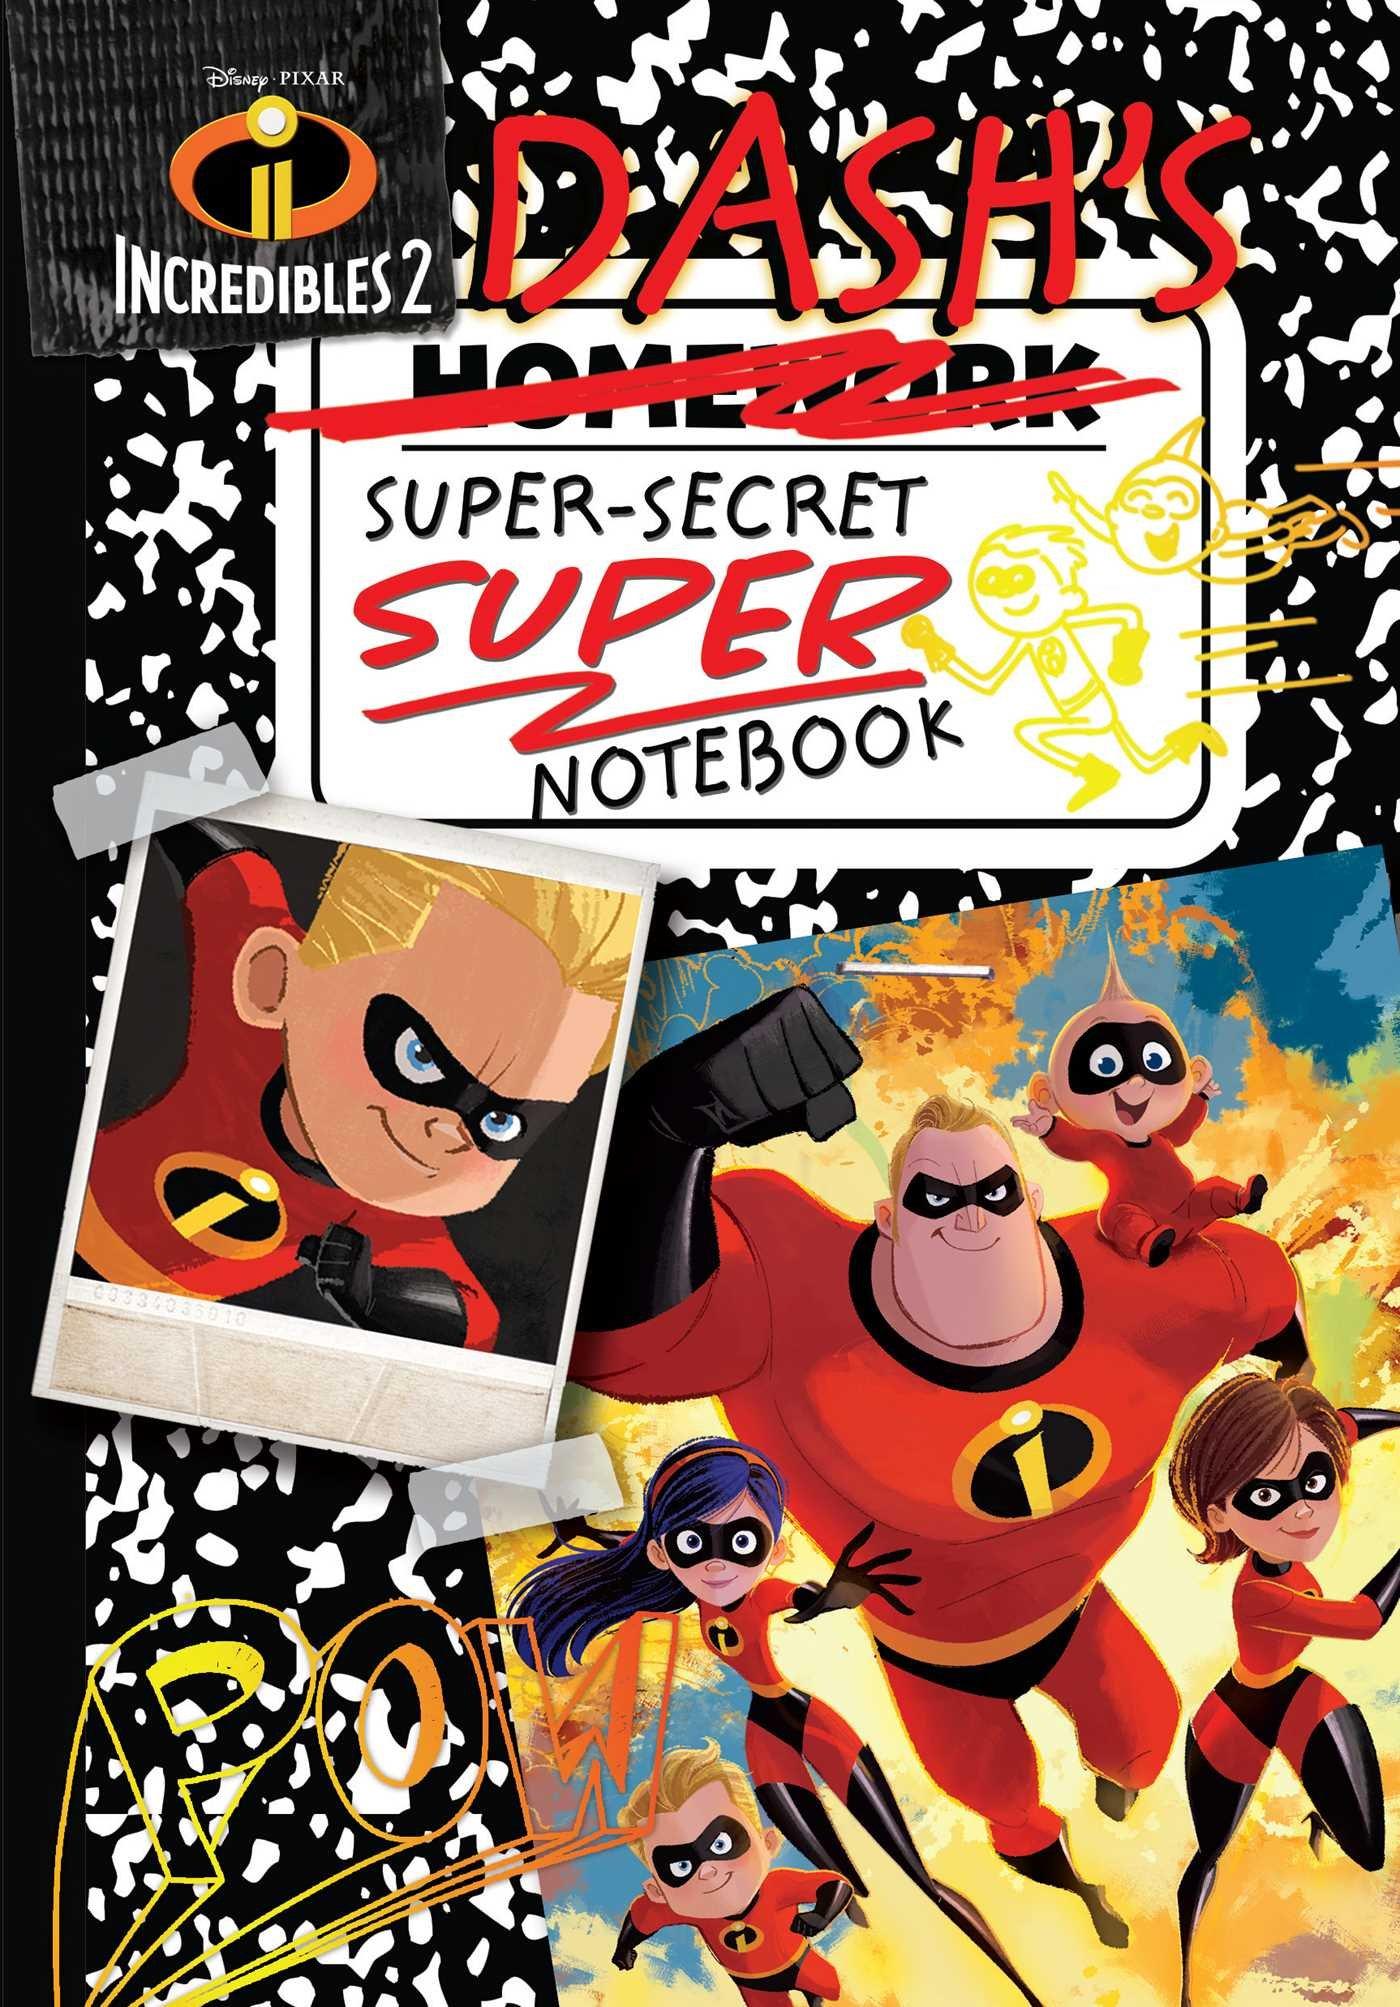 Download Disney Pixar Incredibles 2: Dash's Super-Secret Super Notebook (Replica Journal) ebook